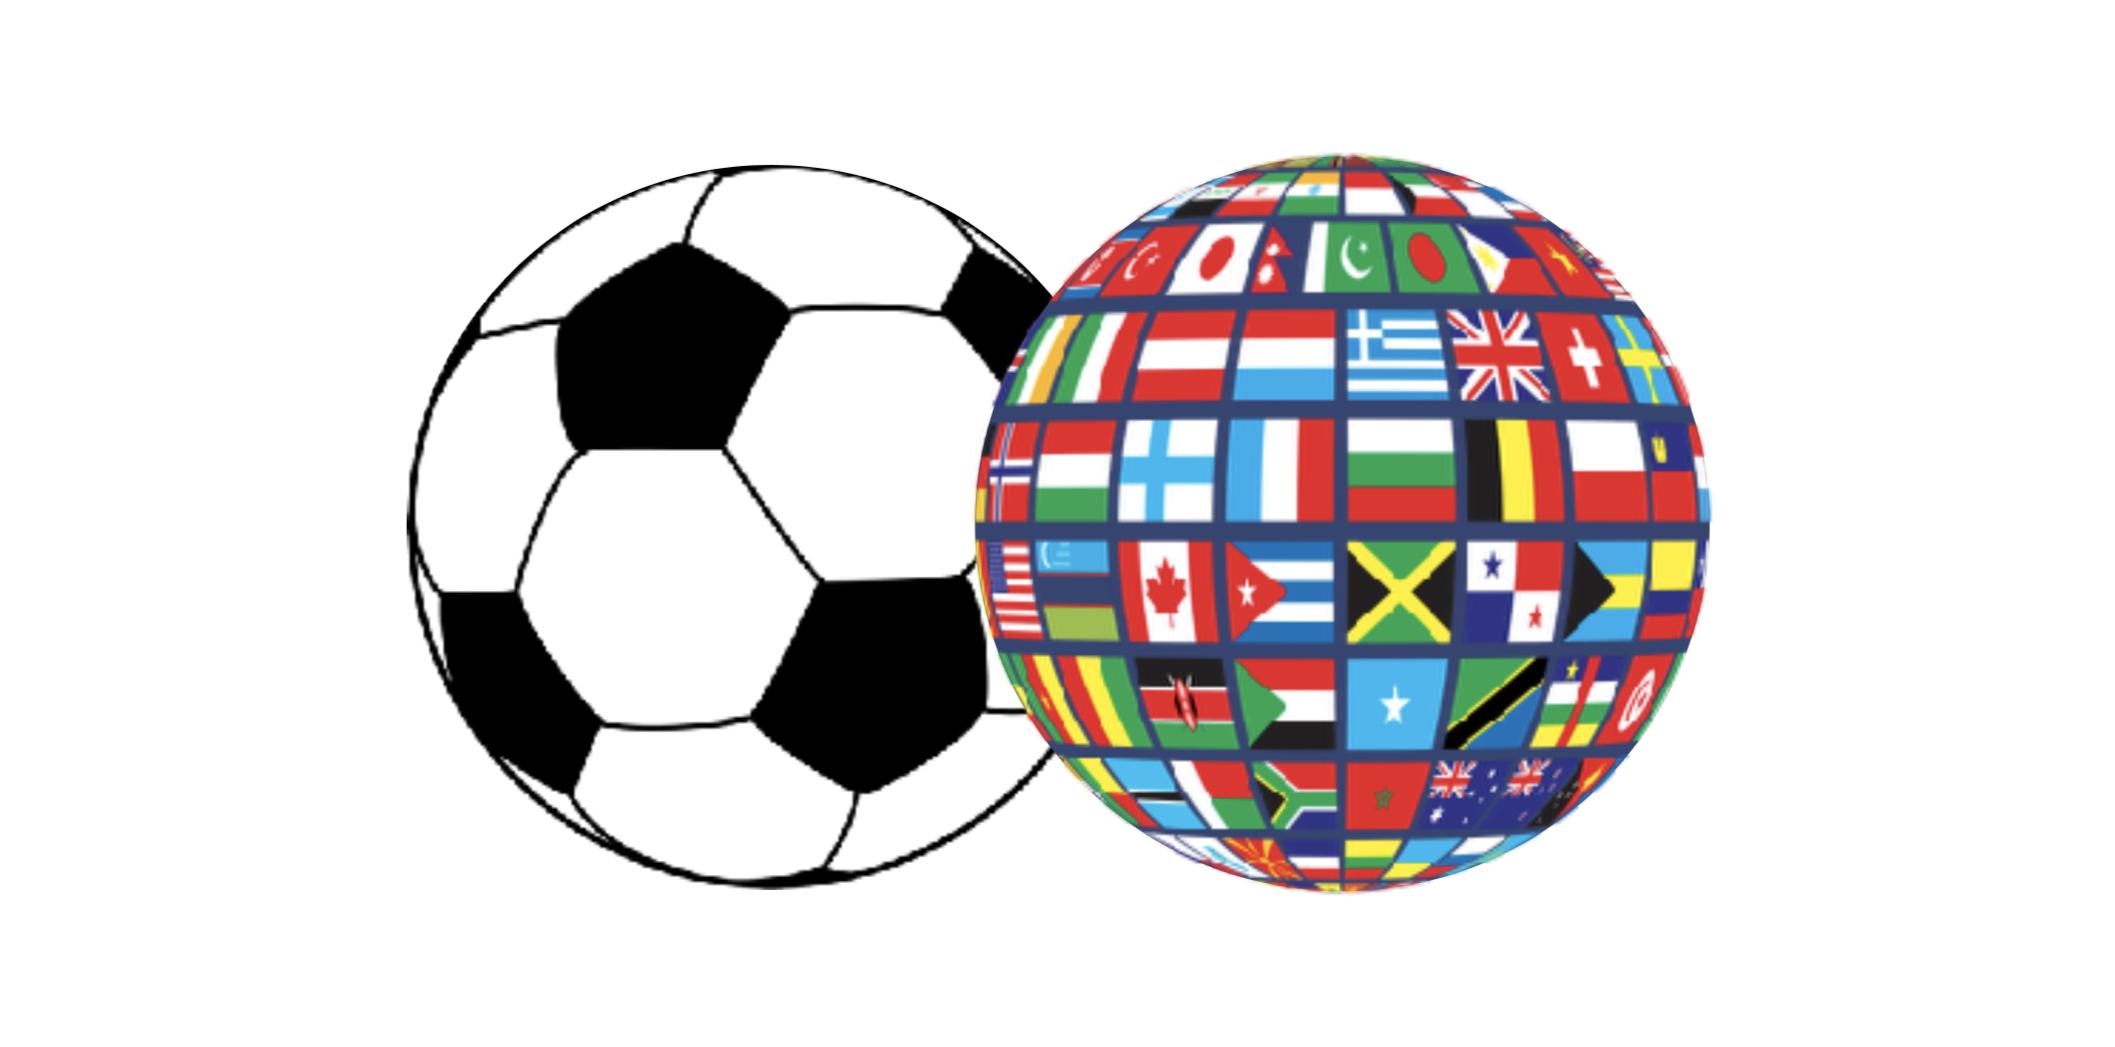 Ballen logo transparant.png